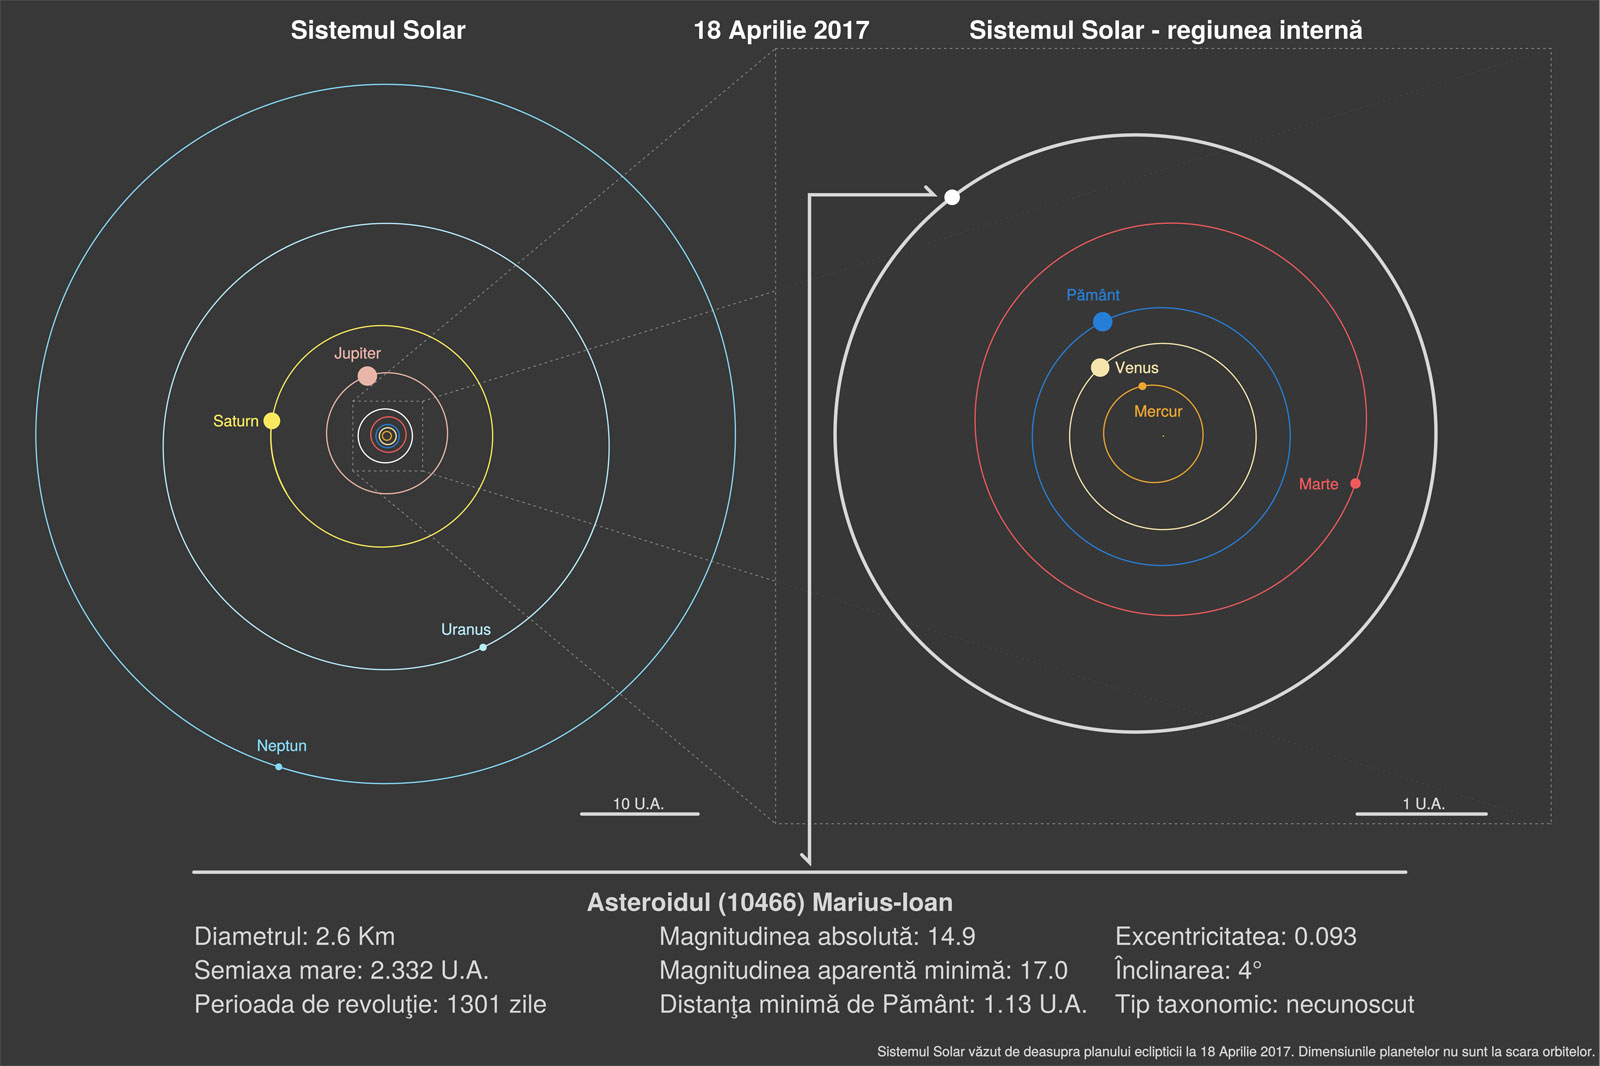 asteroid-prunariu-ioan-marius-stiinta-tehnica-2